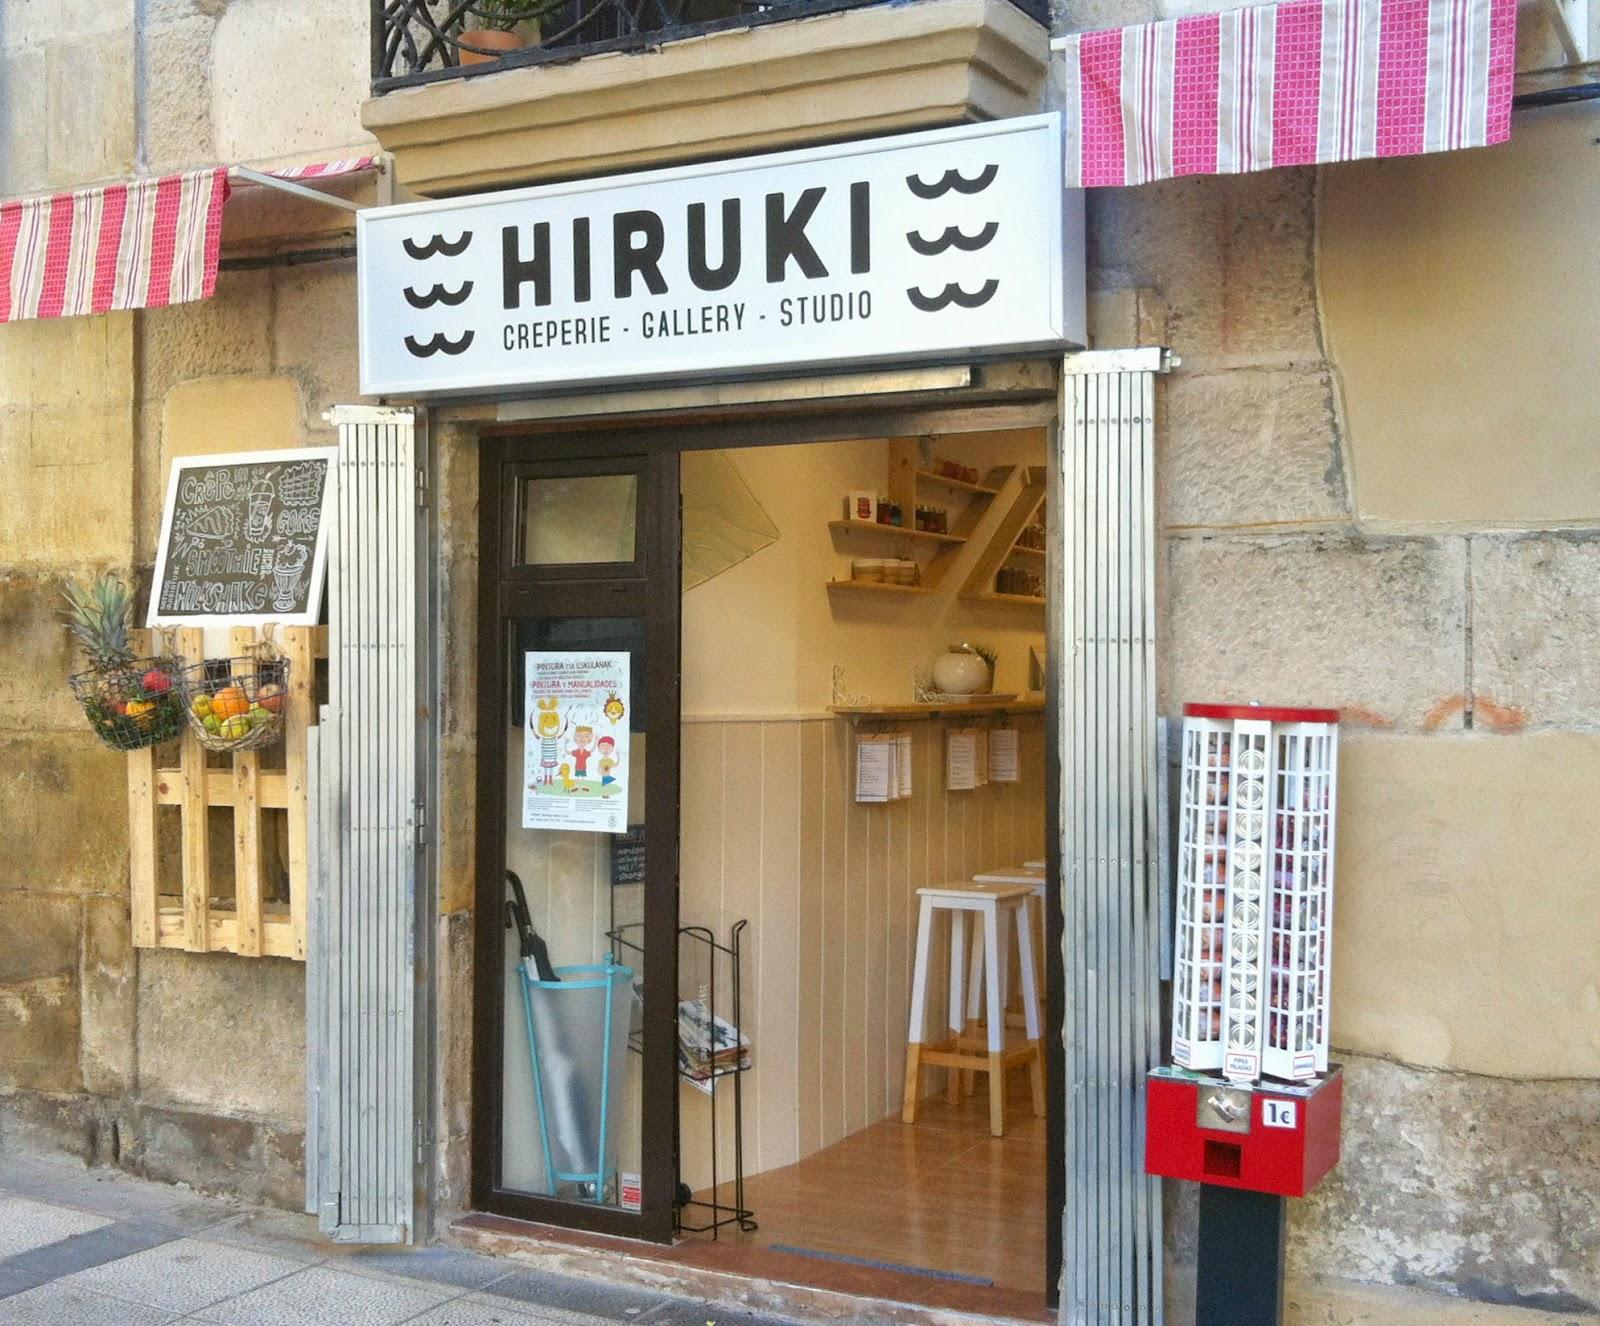 Hiruki, crepería en Irun